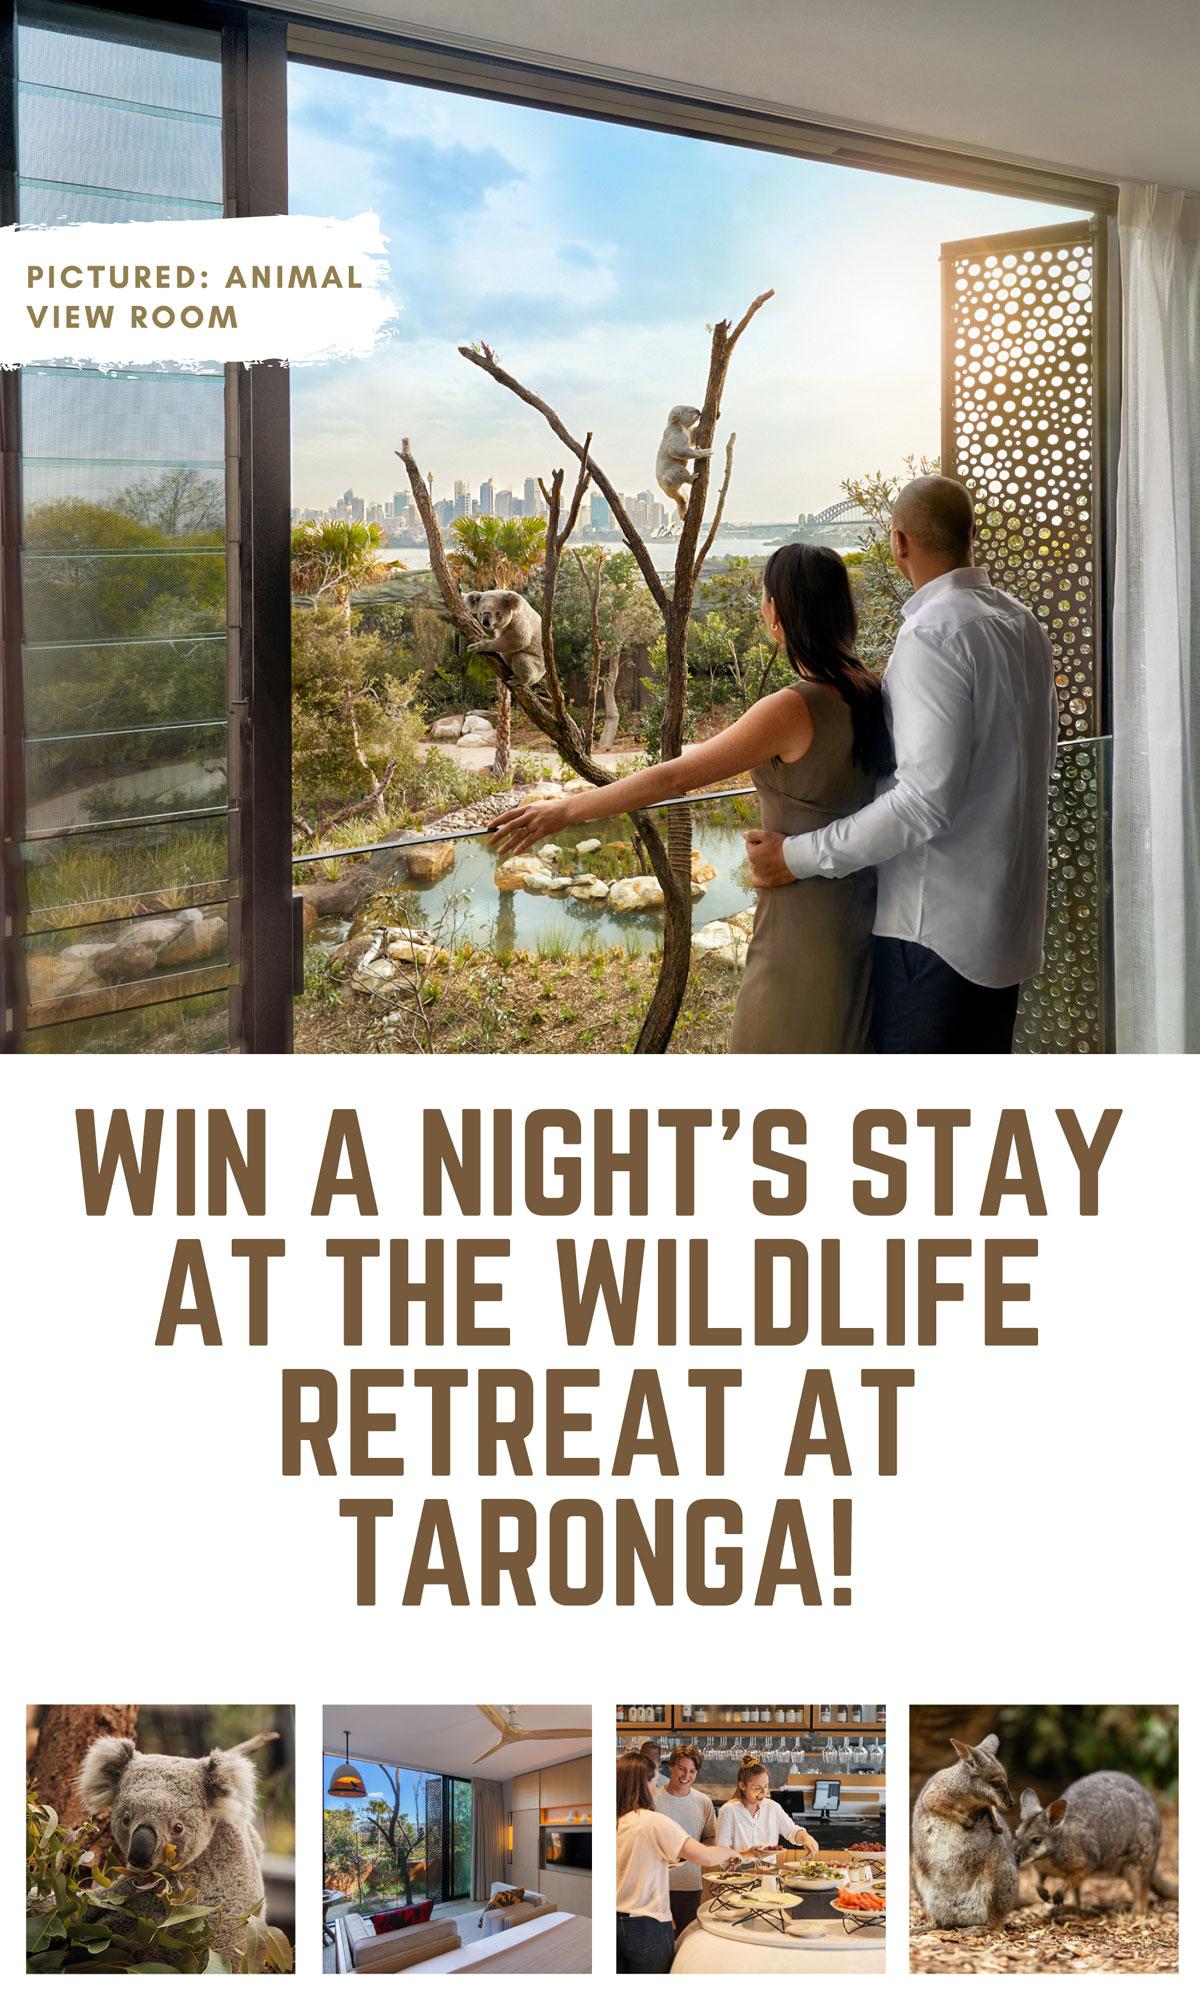 WIN a Night's Stay at The Wildlife Retreat Taronga!